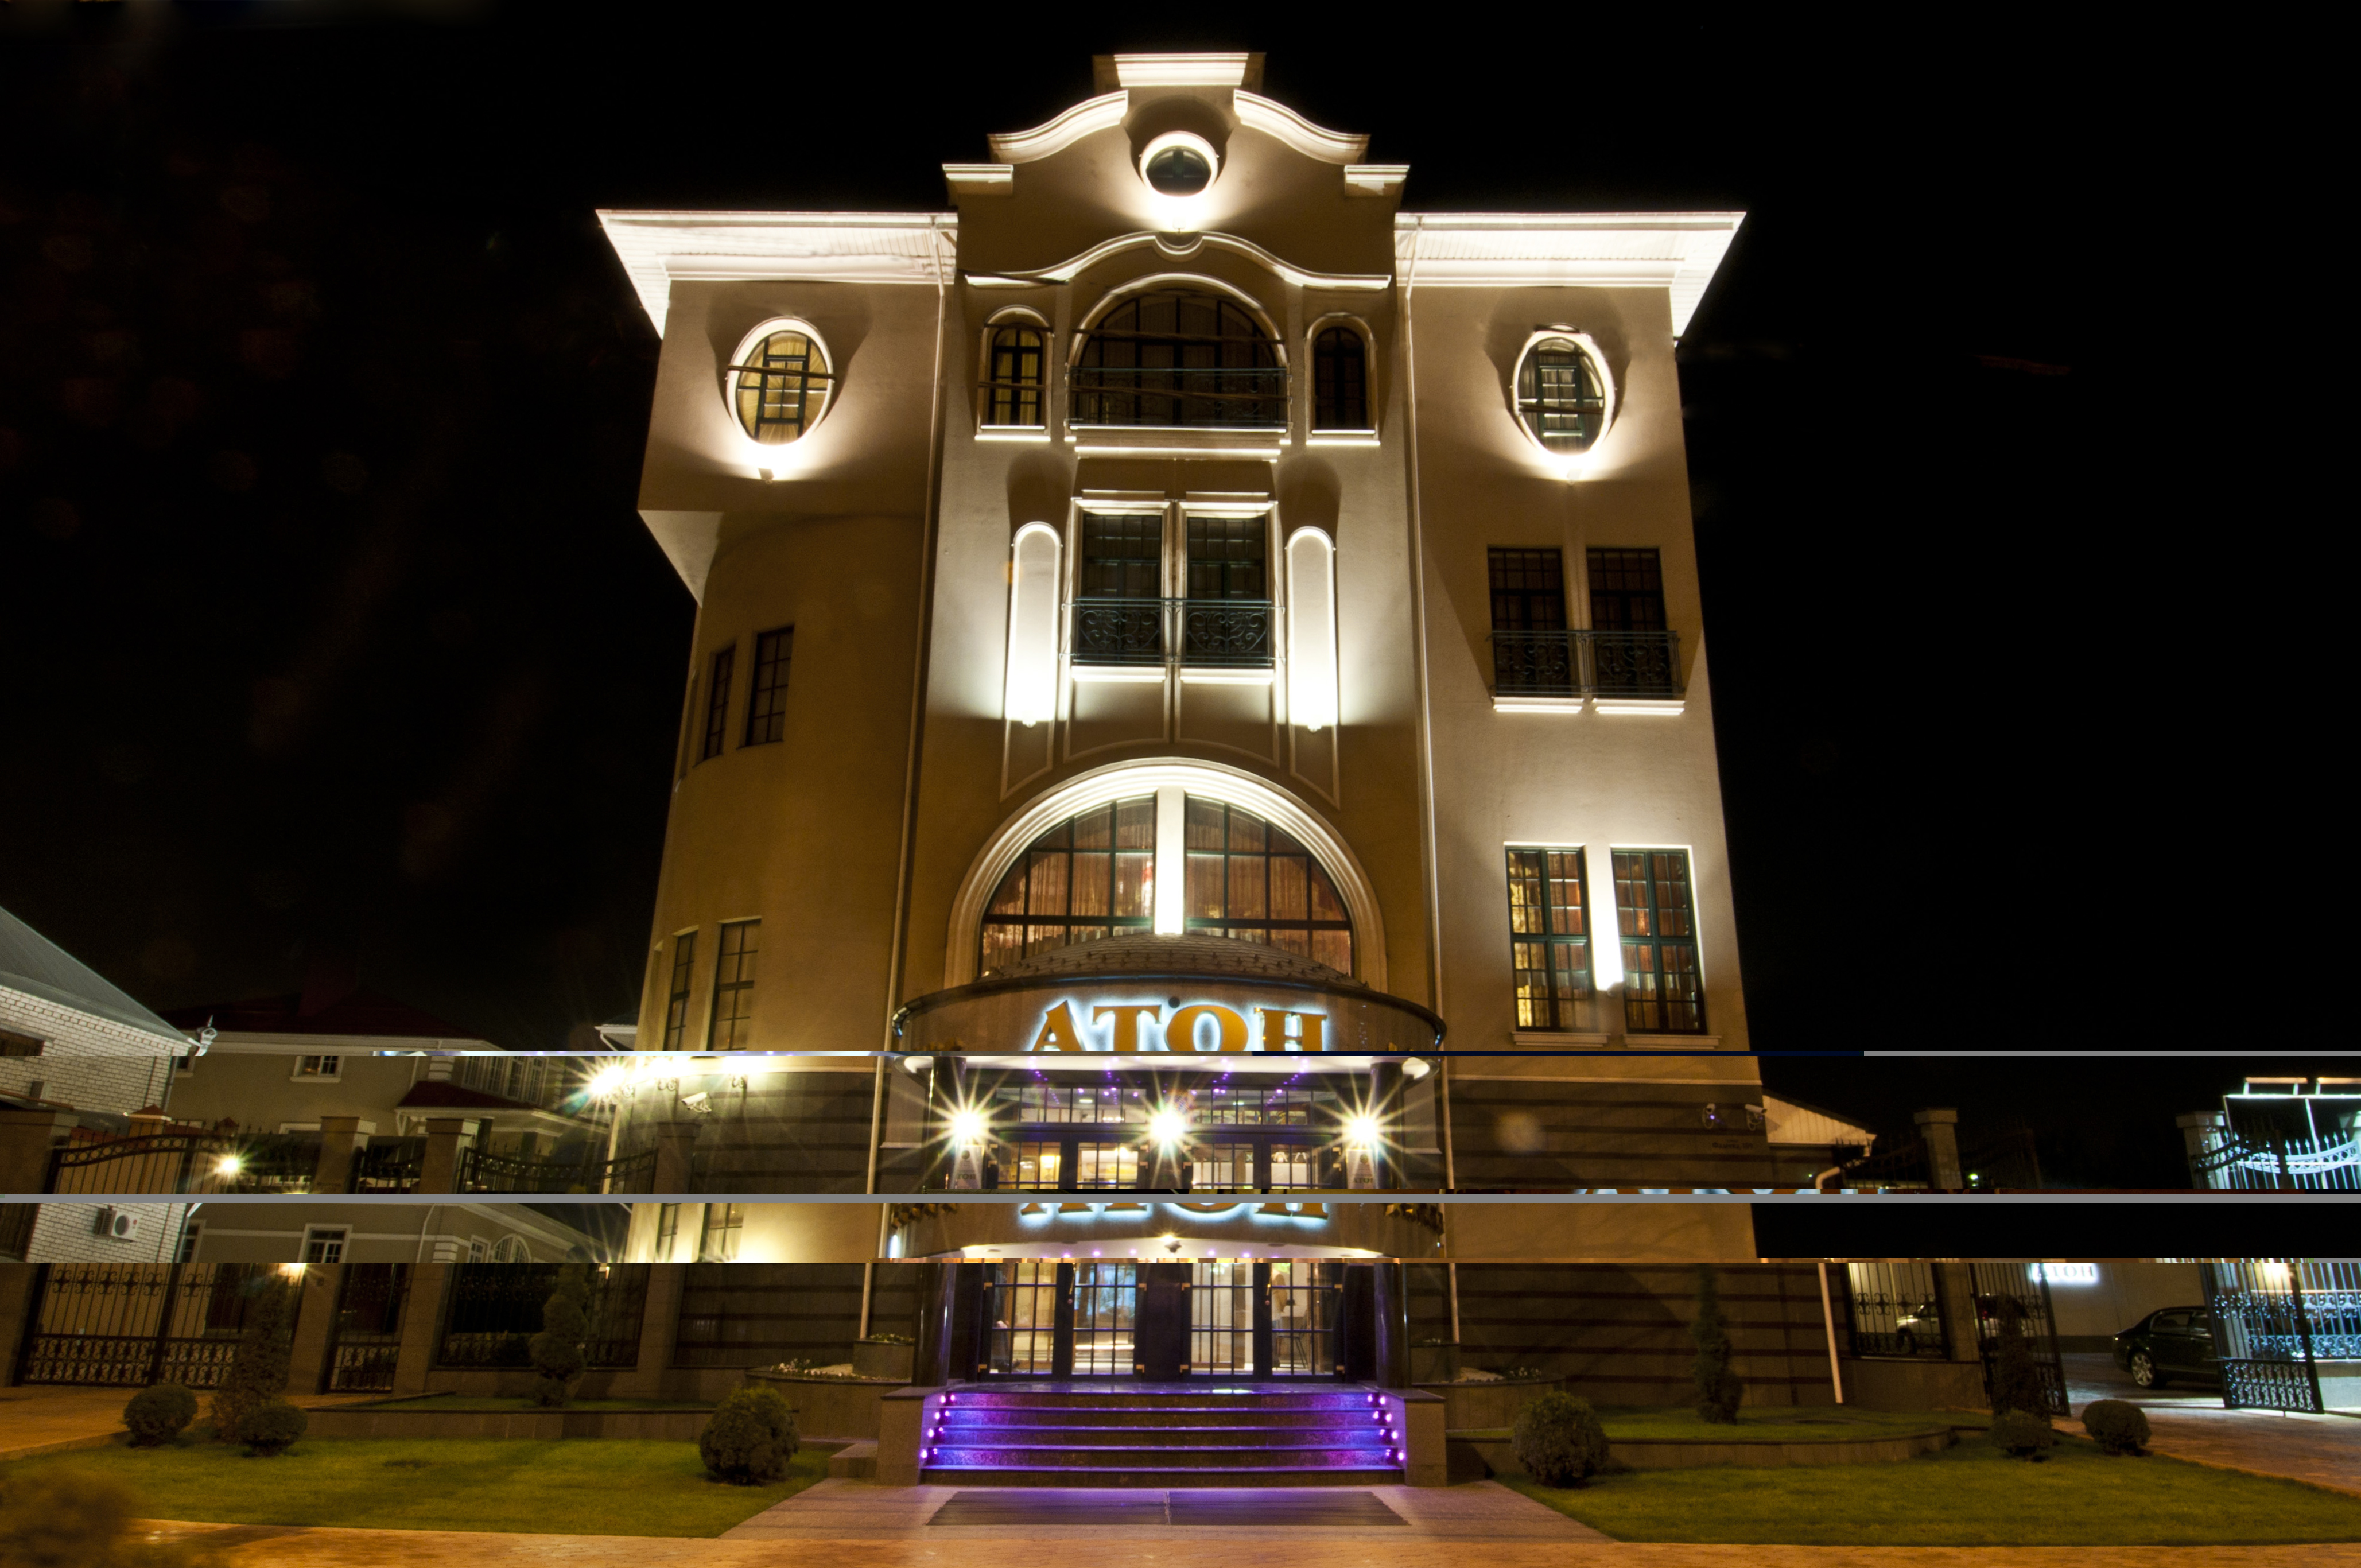 Aton, Krasnodar gorsovet